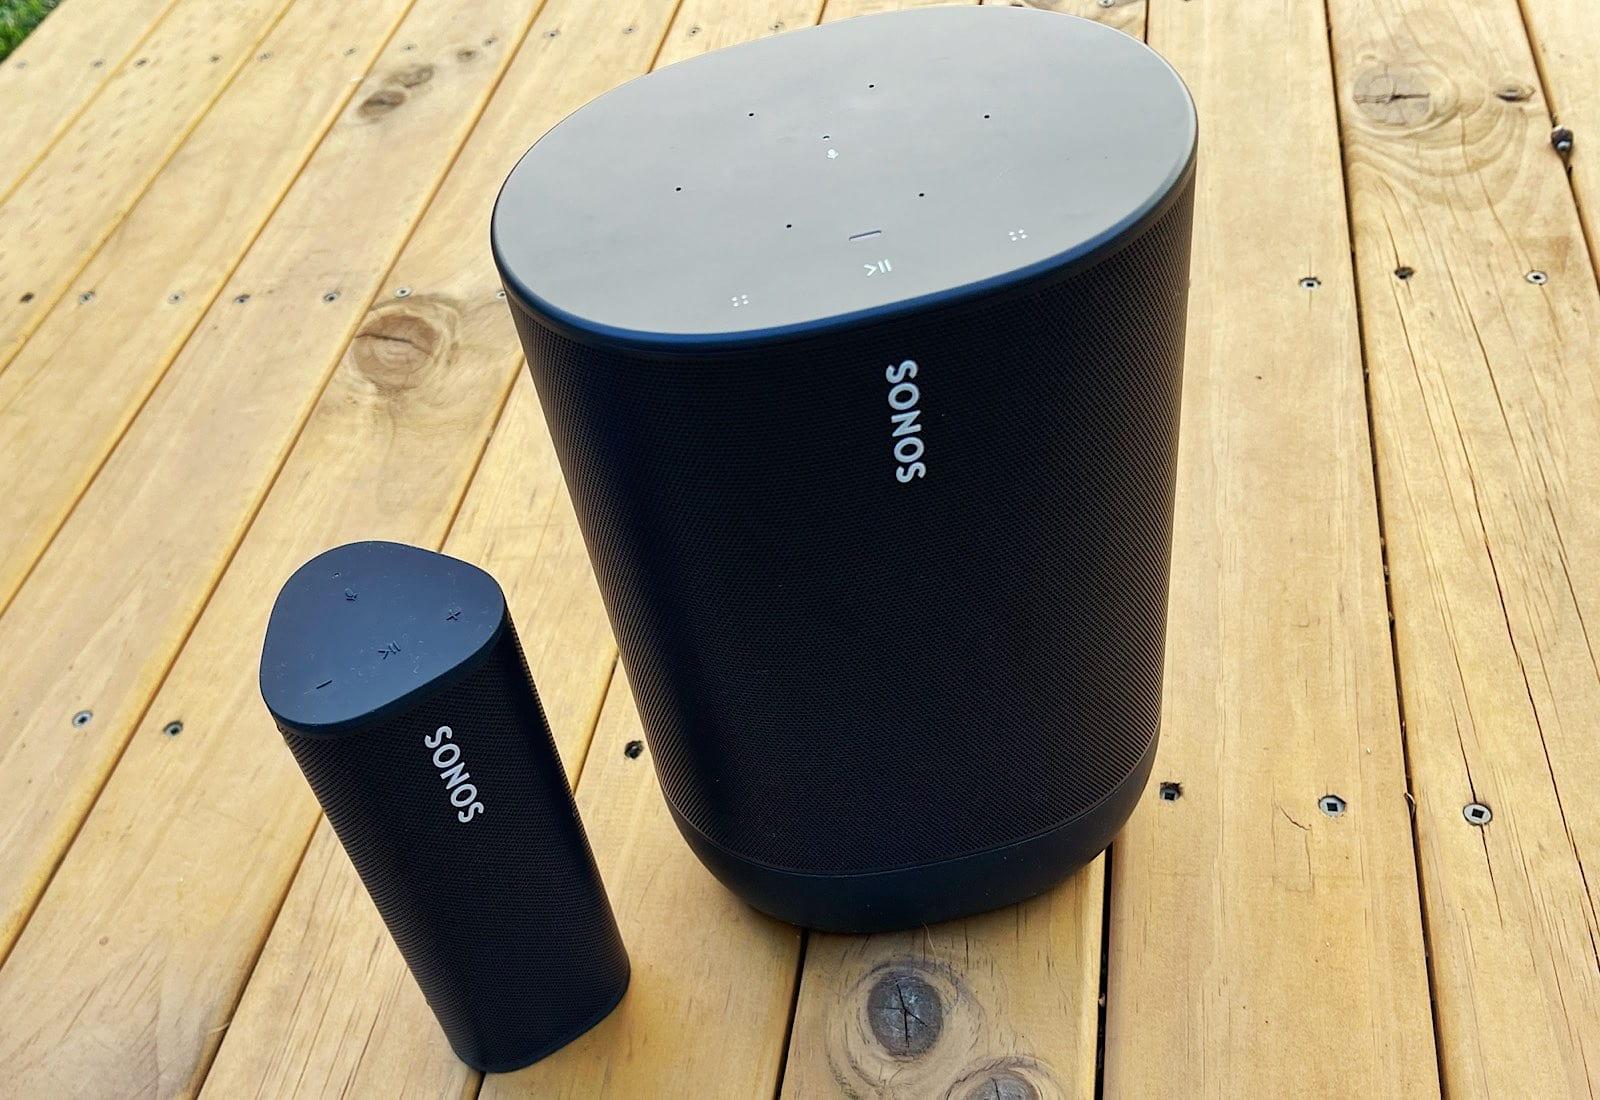 Sonos Roam (left) and Sonos Move (right)